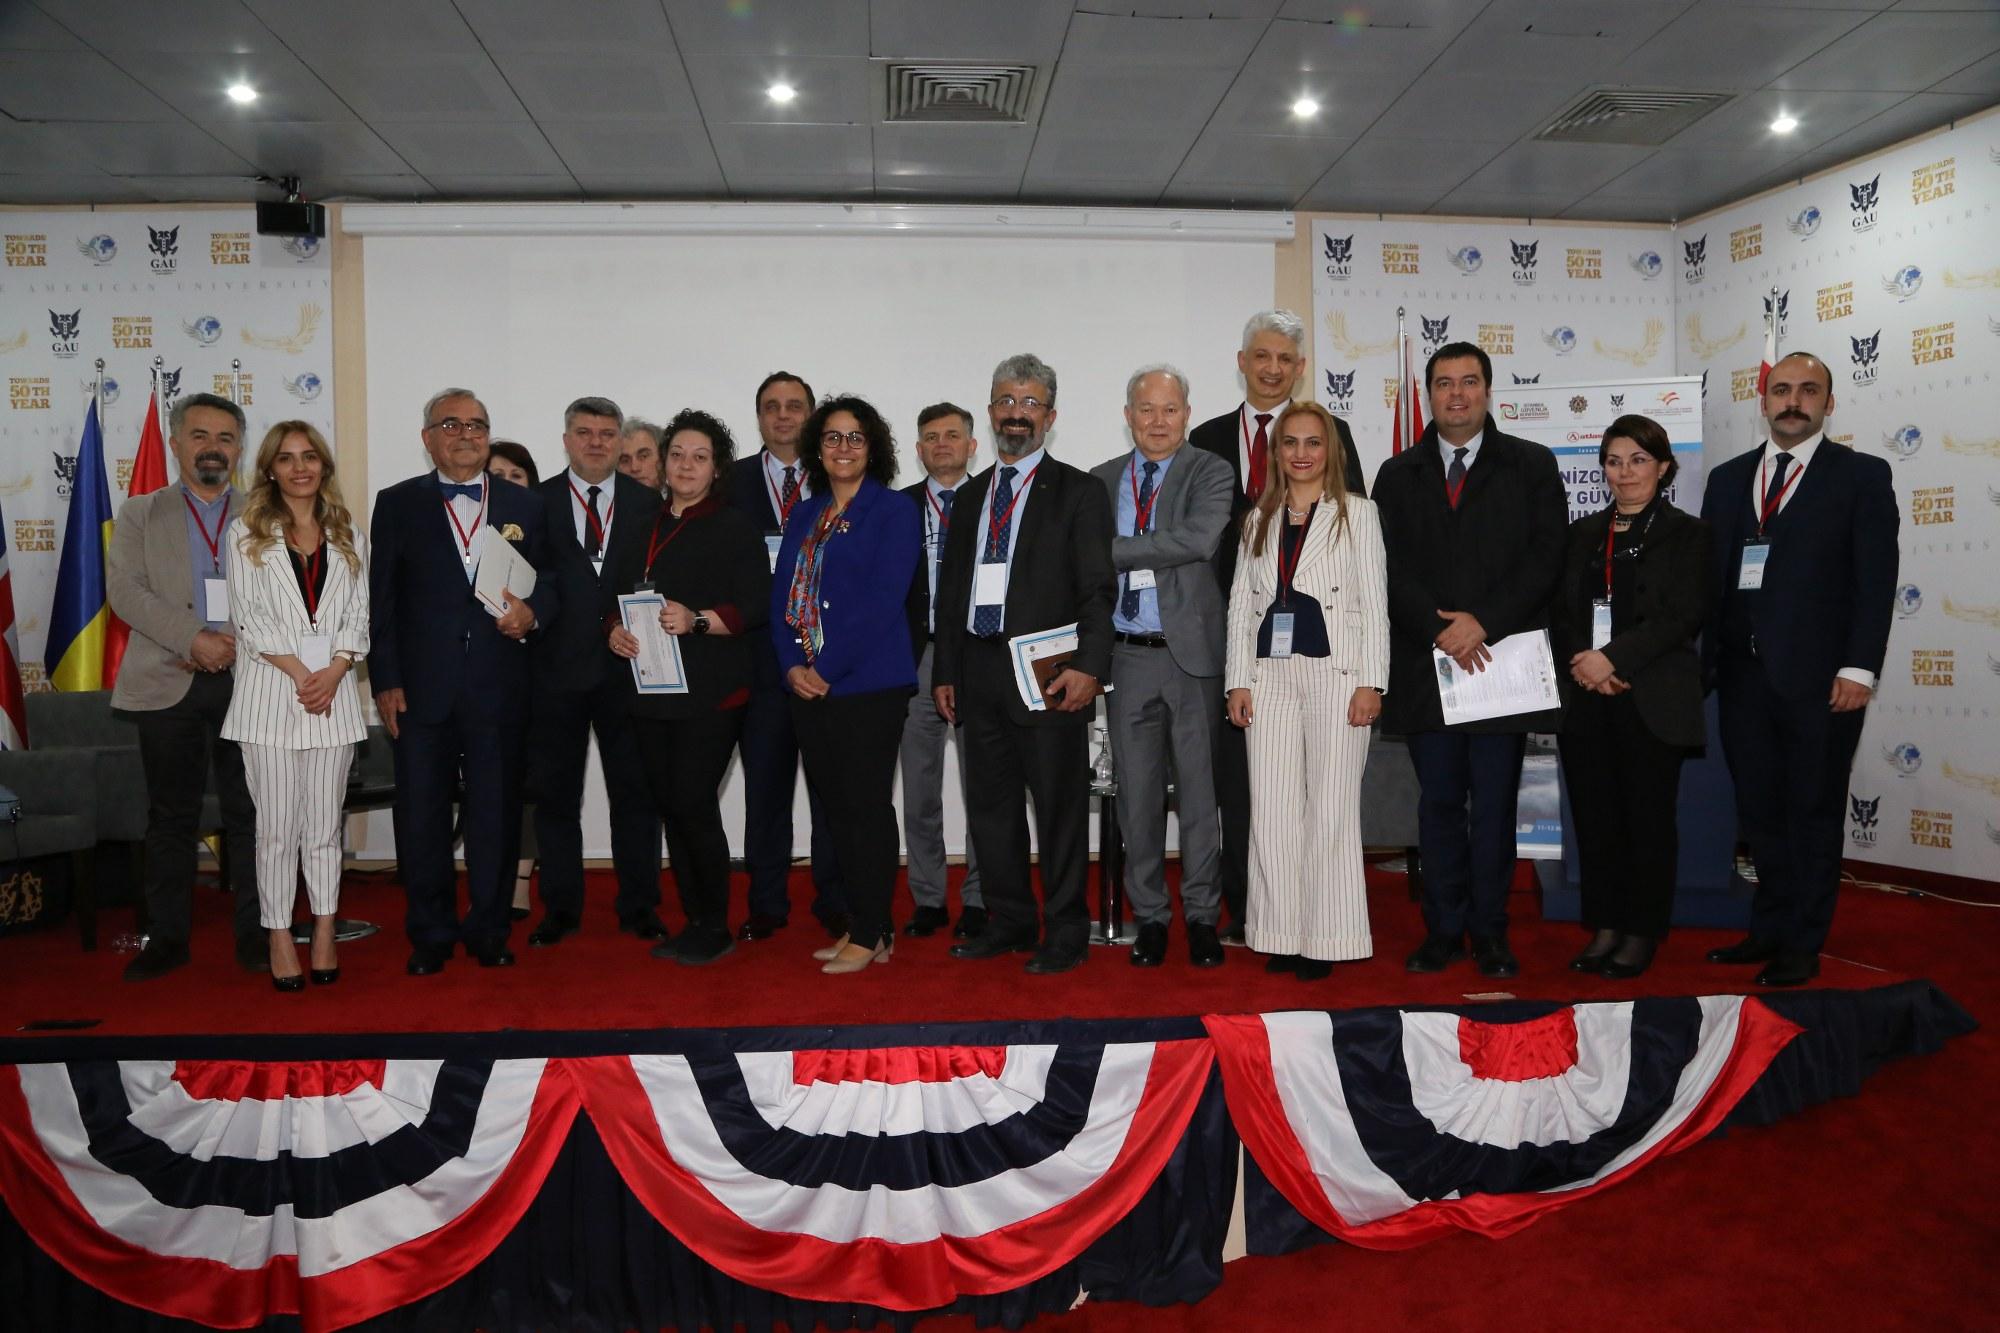 gau-tasam-deniz-guvenligi-forumu-2019-3.JPG